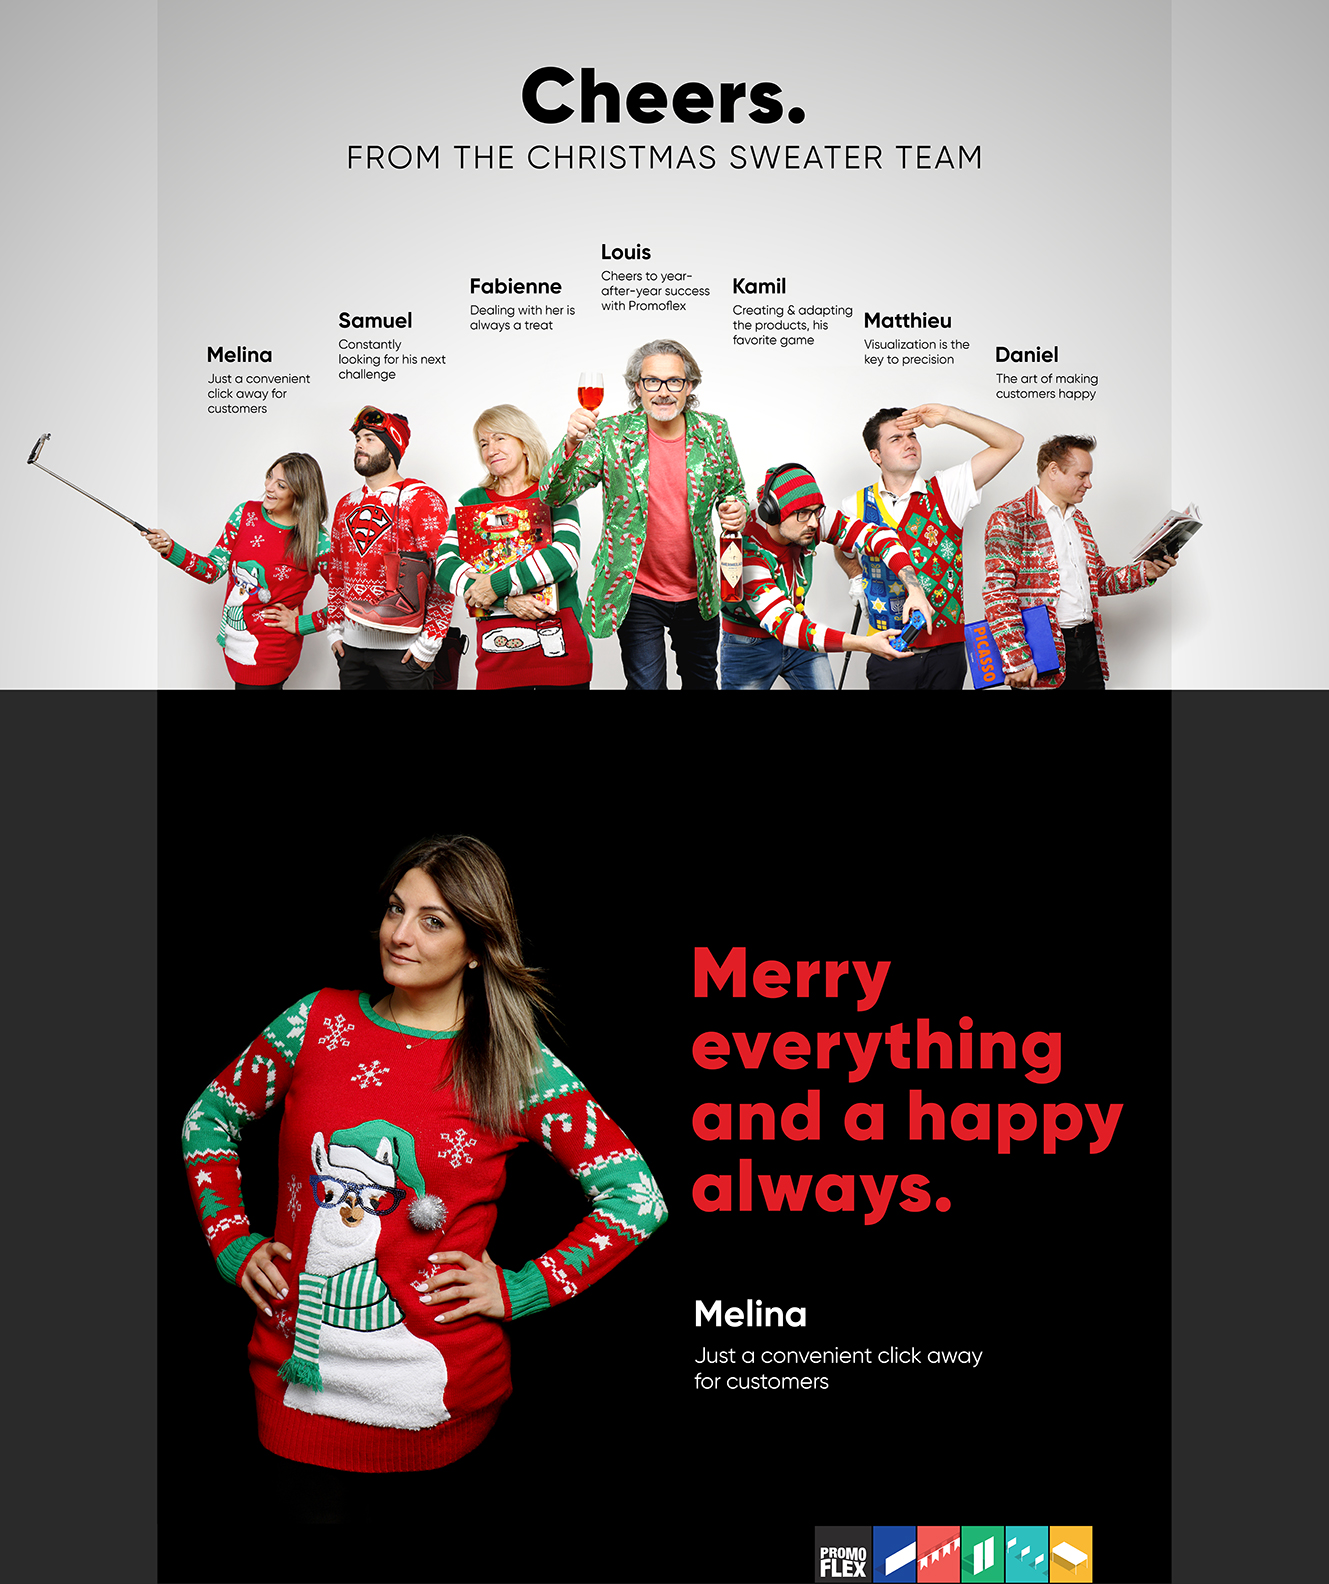 Holiday_sending_2018_grp_melina_en.jpg (929 KB)